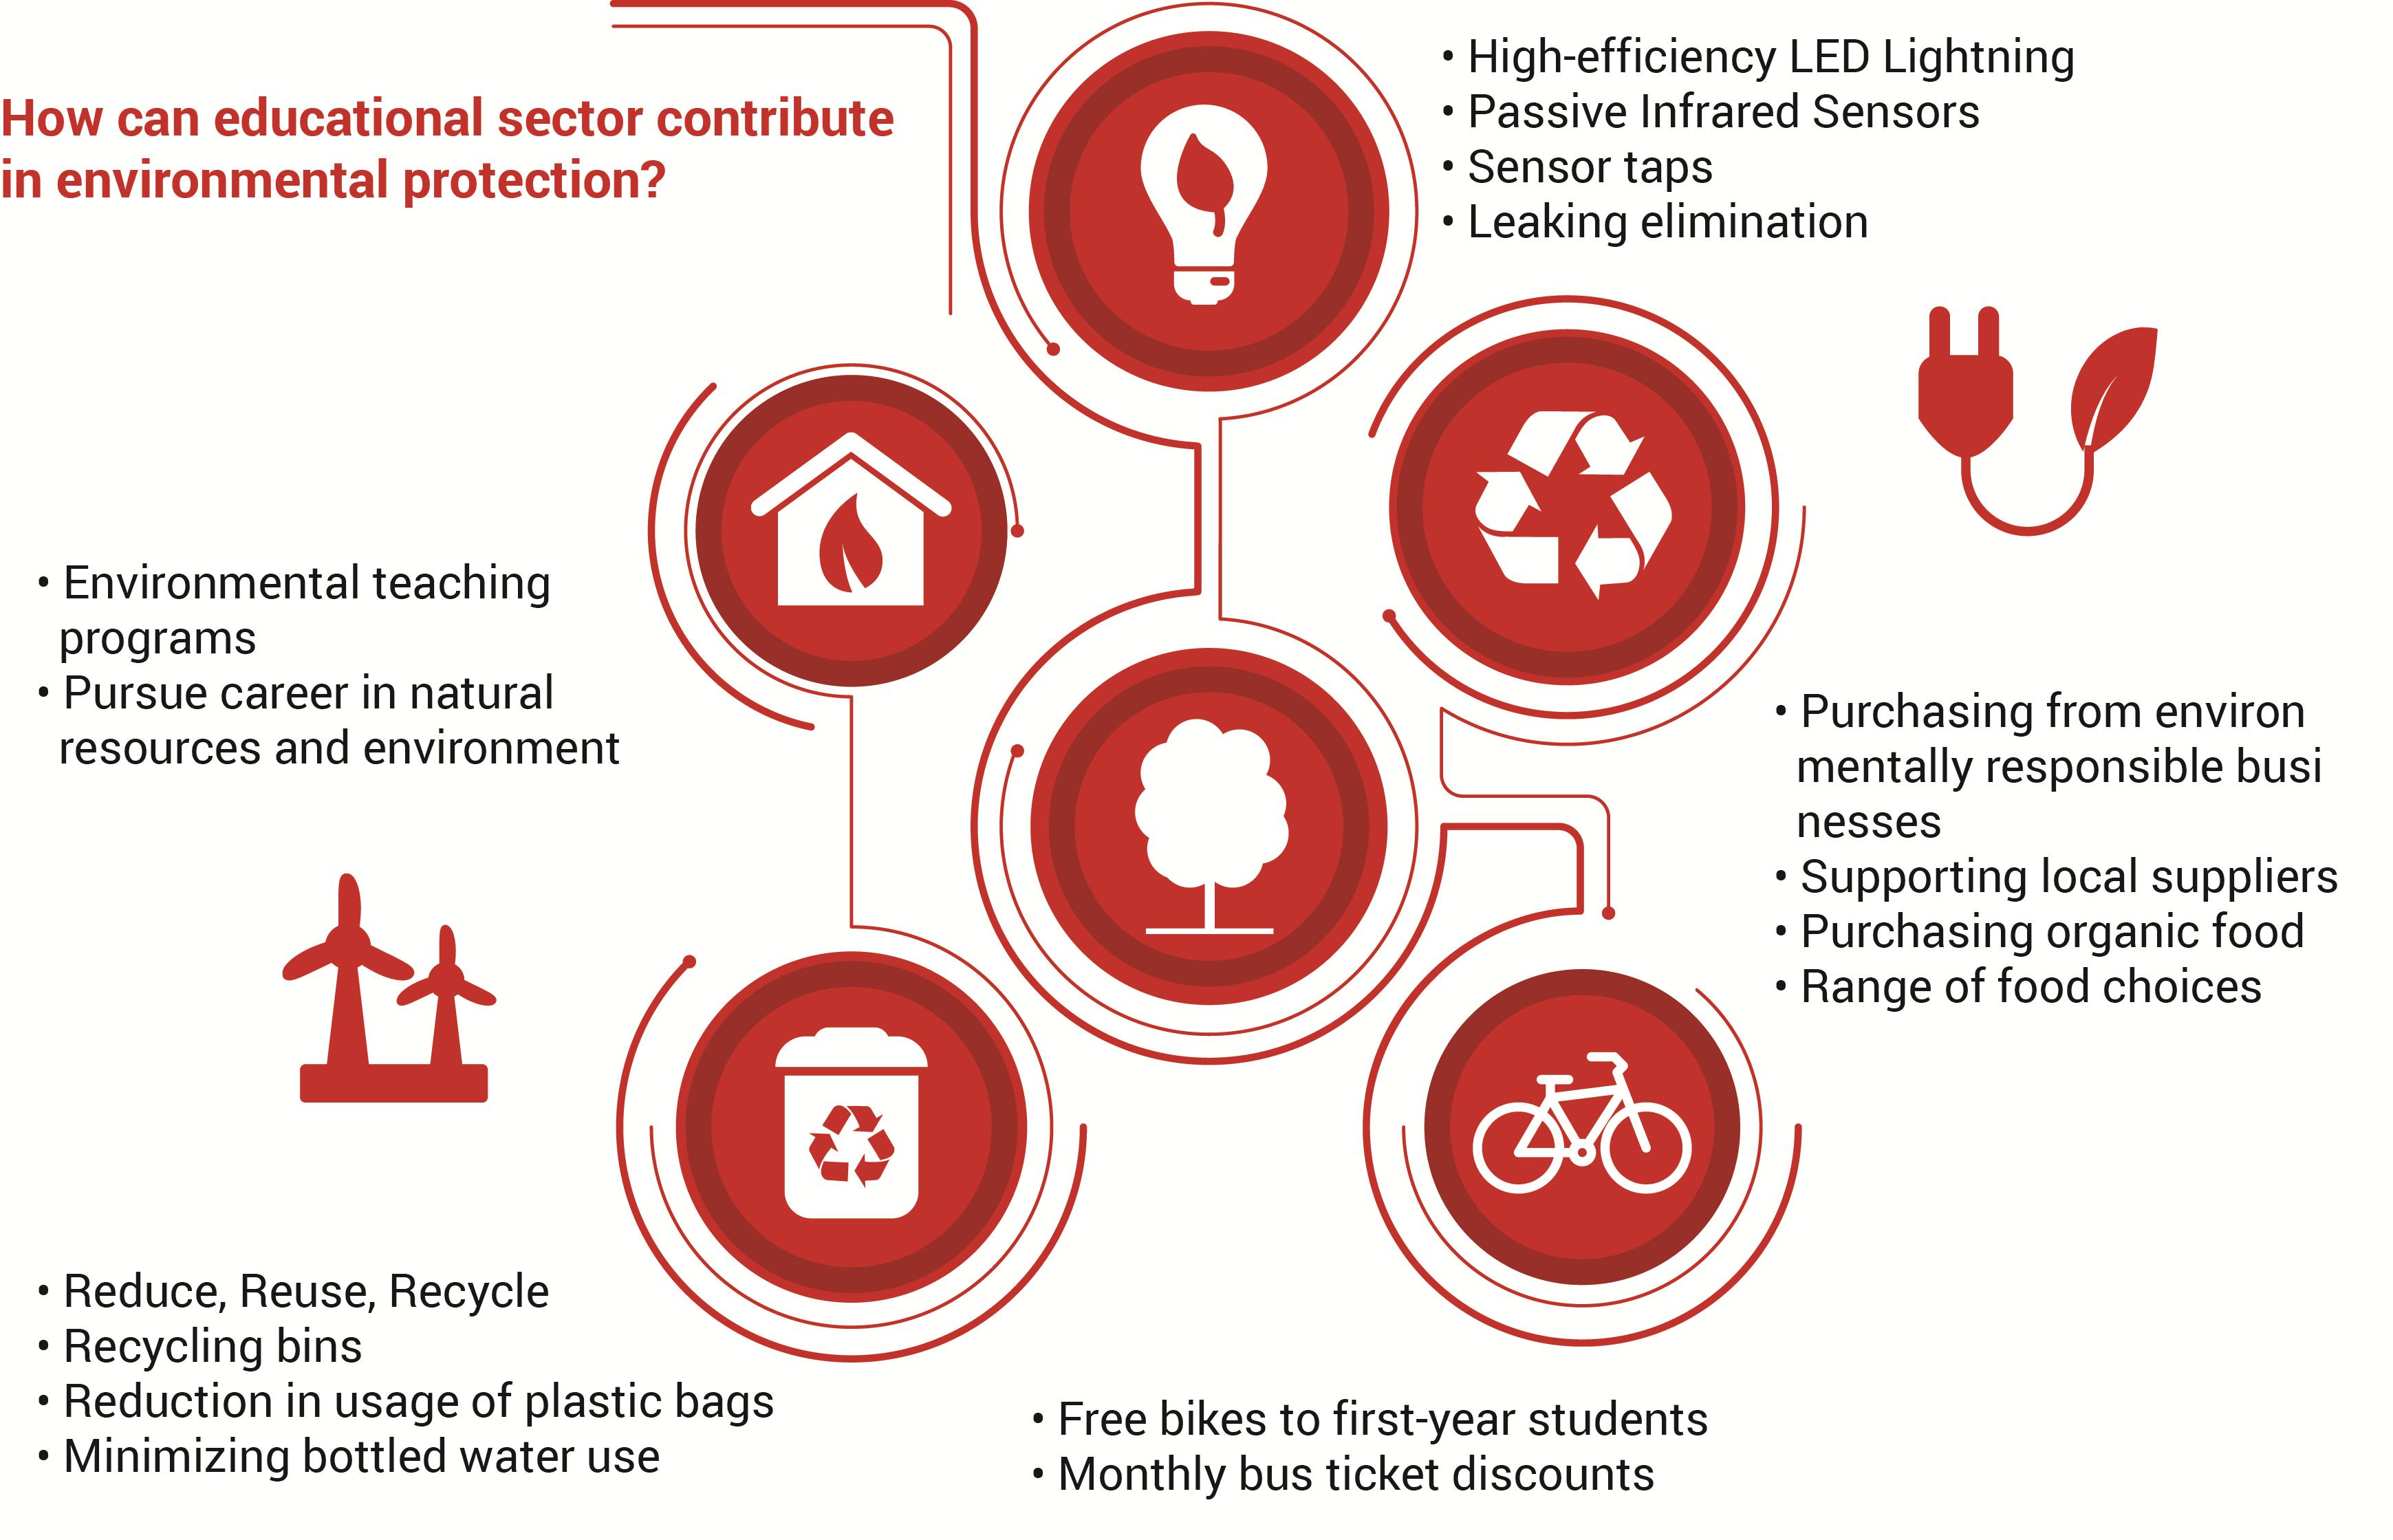 environment benefits contribution